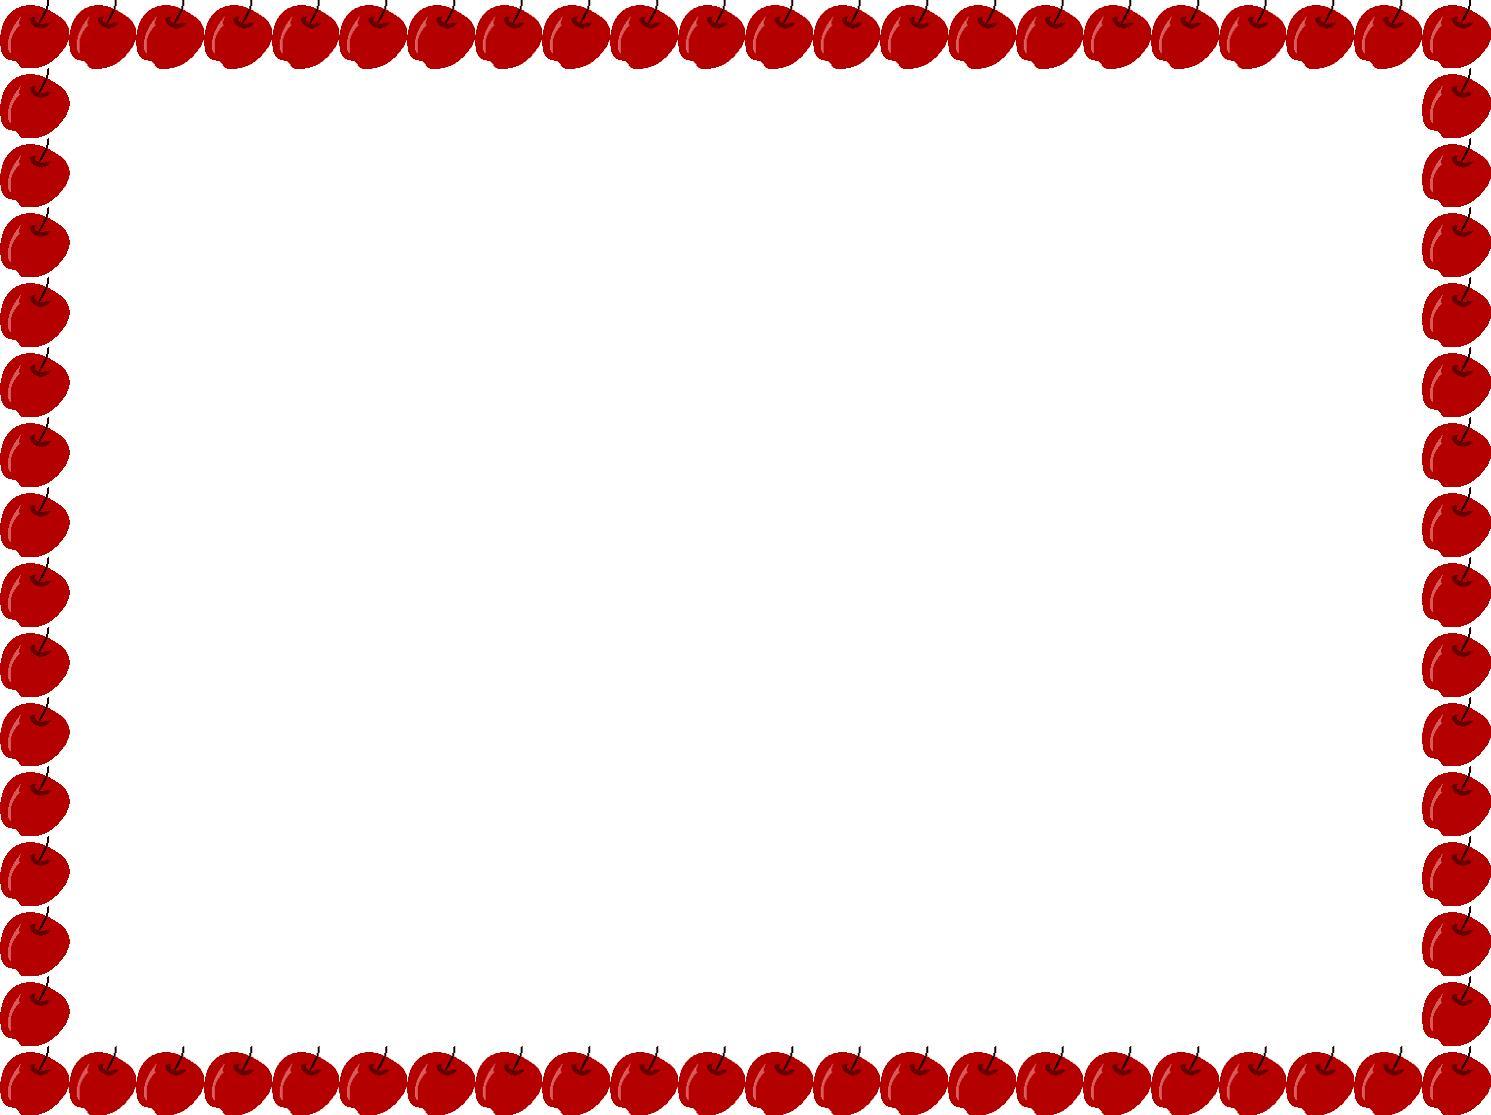 1491x1115 Apple Border Clipart